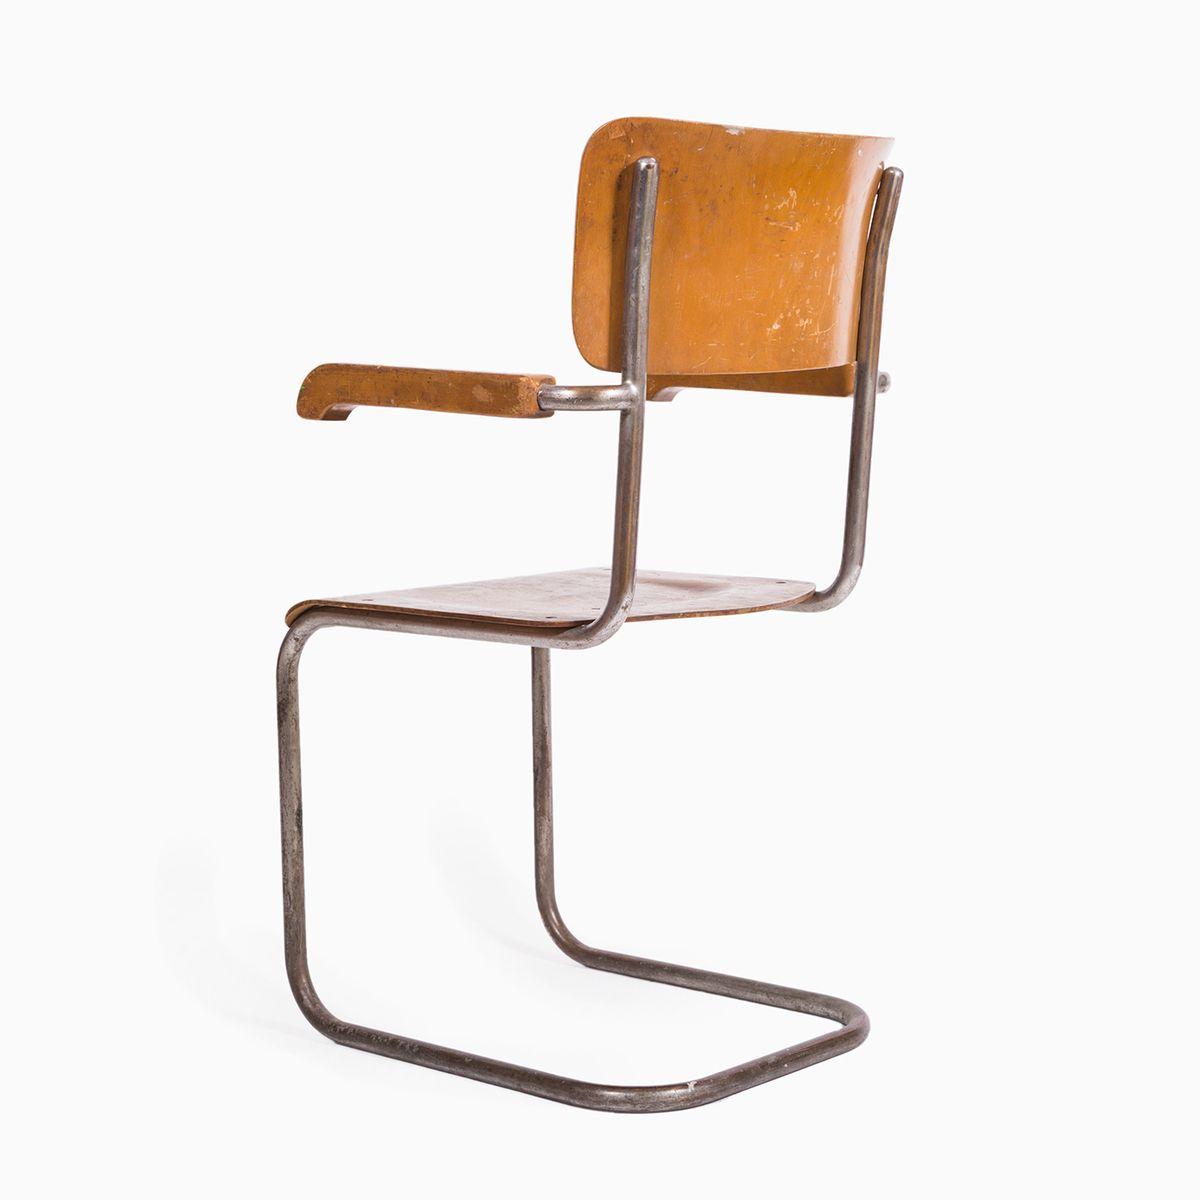 brauner mid century stuhl 1960er bei pamono kaufen. Black Bedroom Furniture Sets. Home Design Ideas